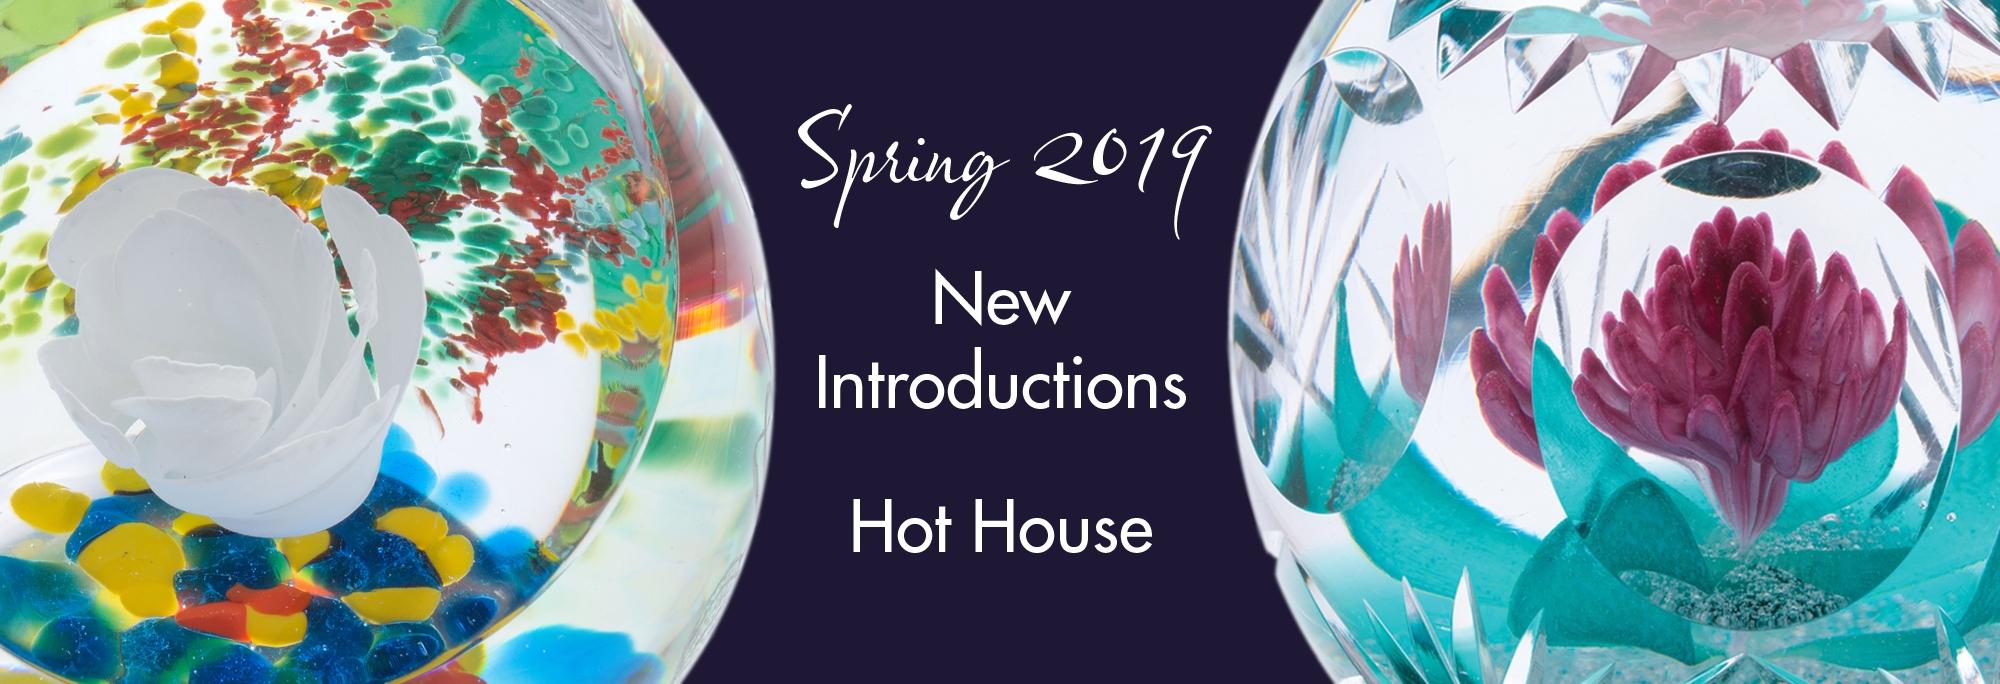 Caithness Glass - New - Spring 2019